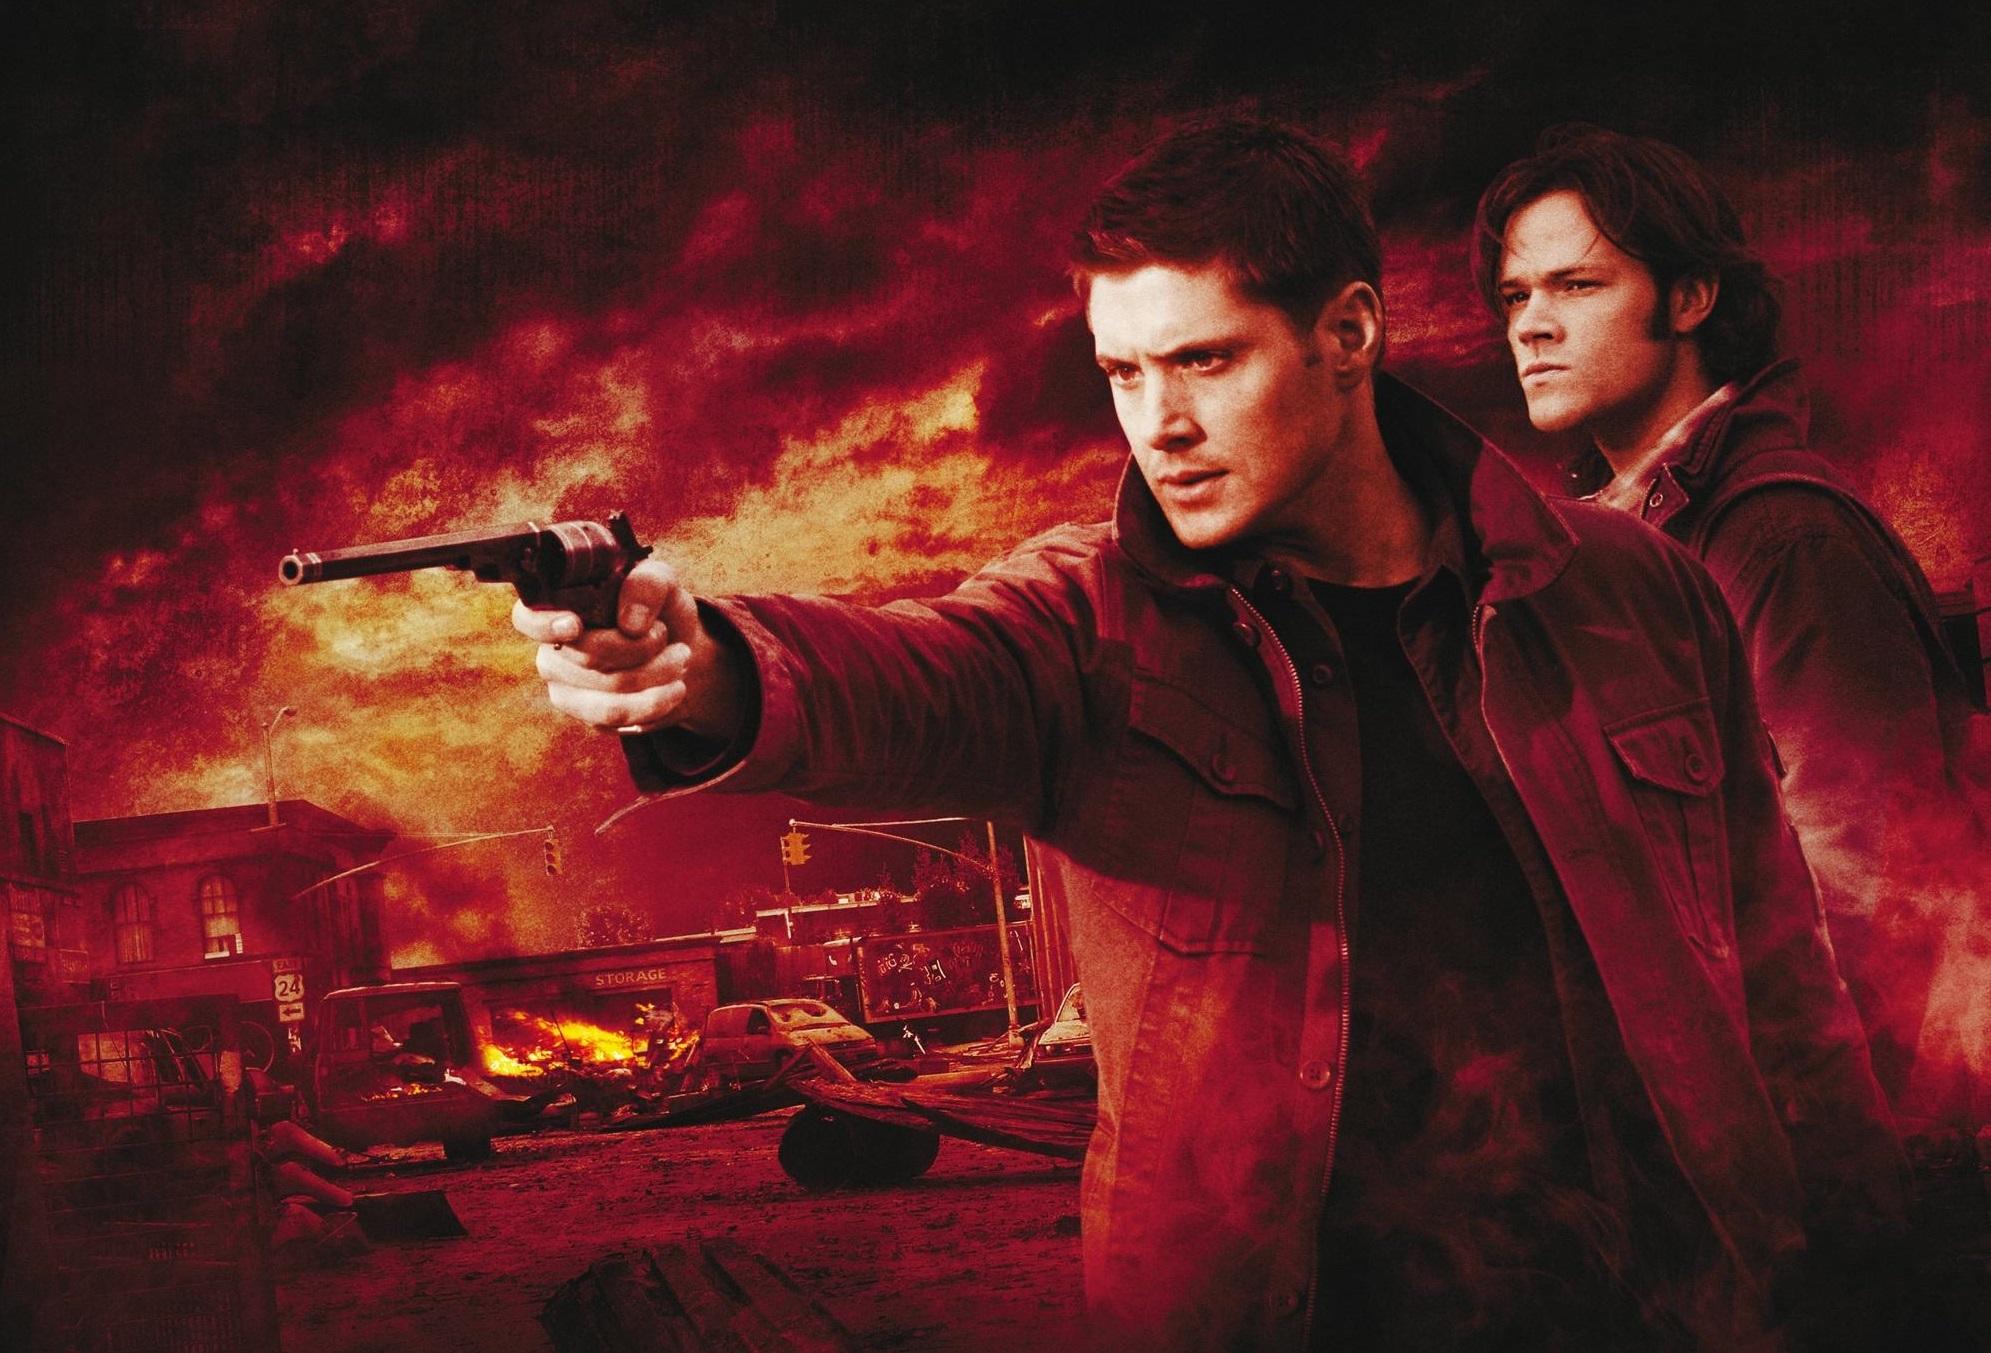 Supernatural season 3 episode 11 online